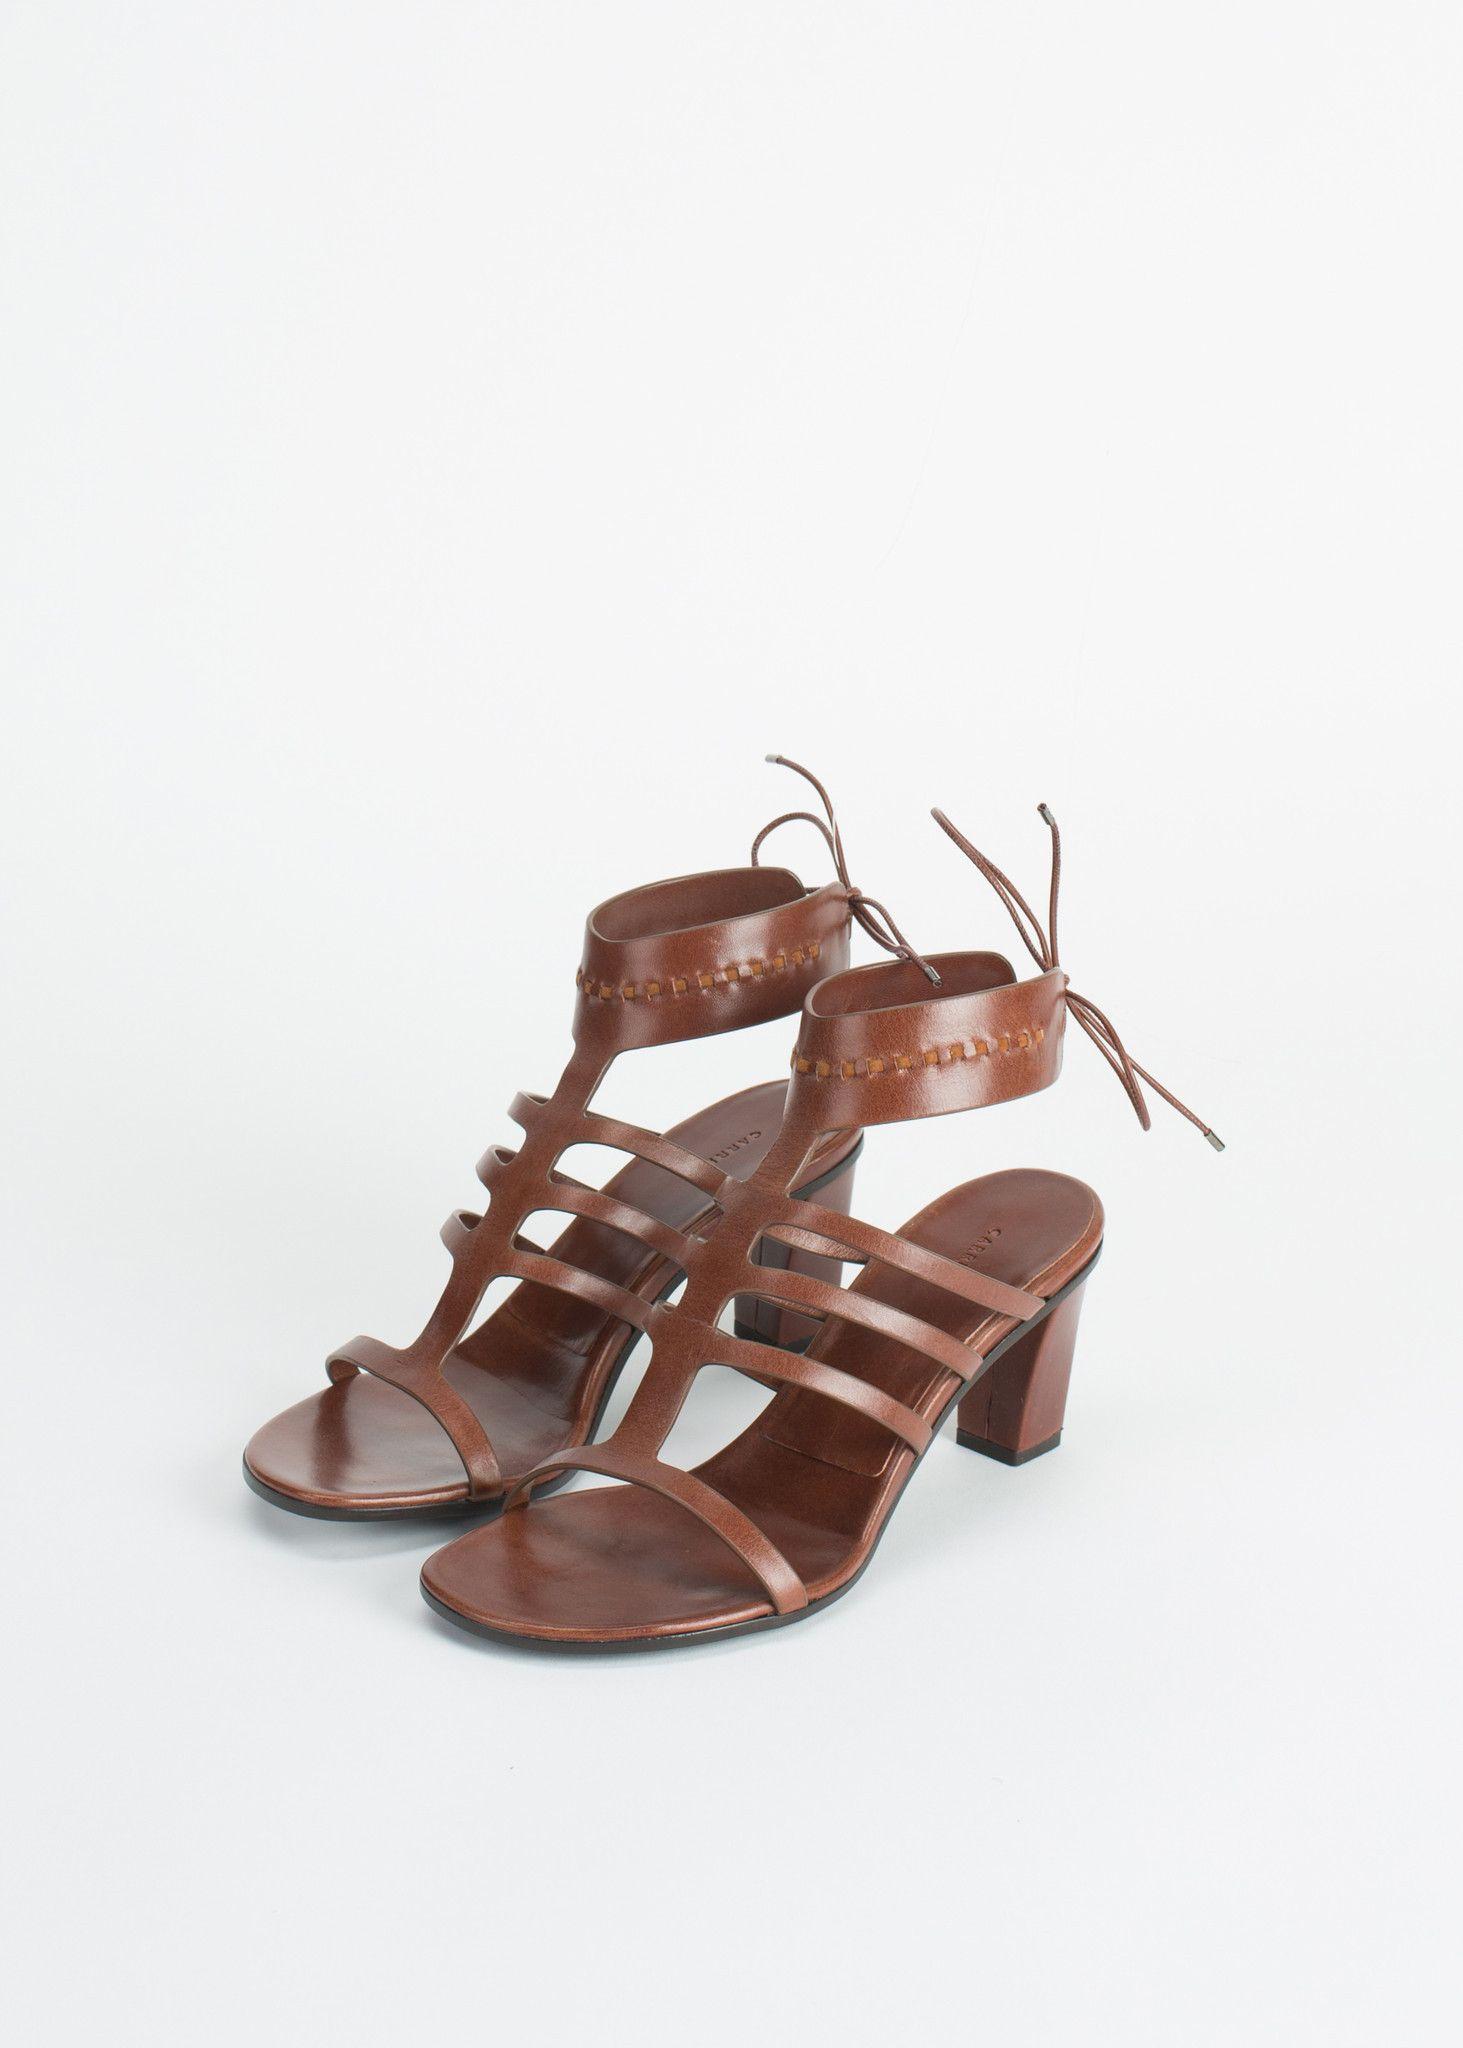 FOOTWEAR - Sandals Carritz 4y21Ascatl